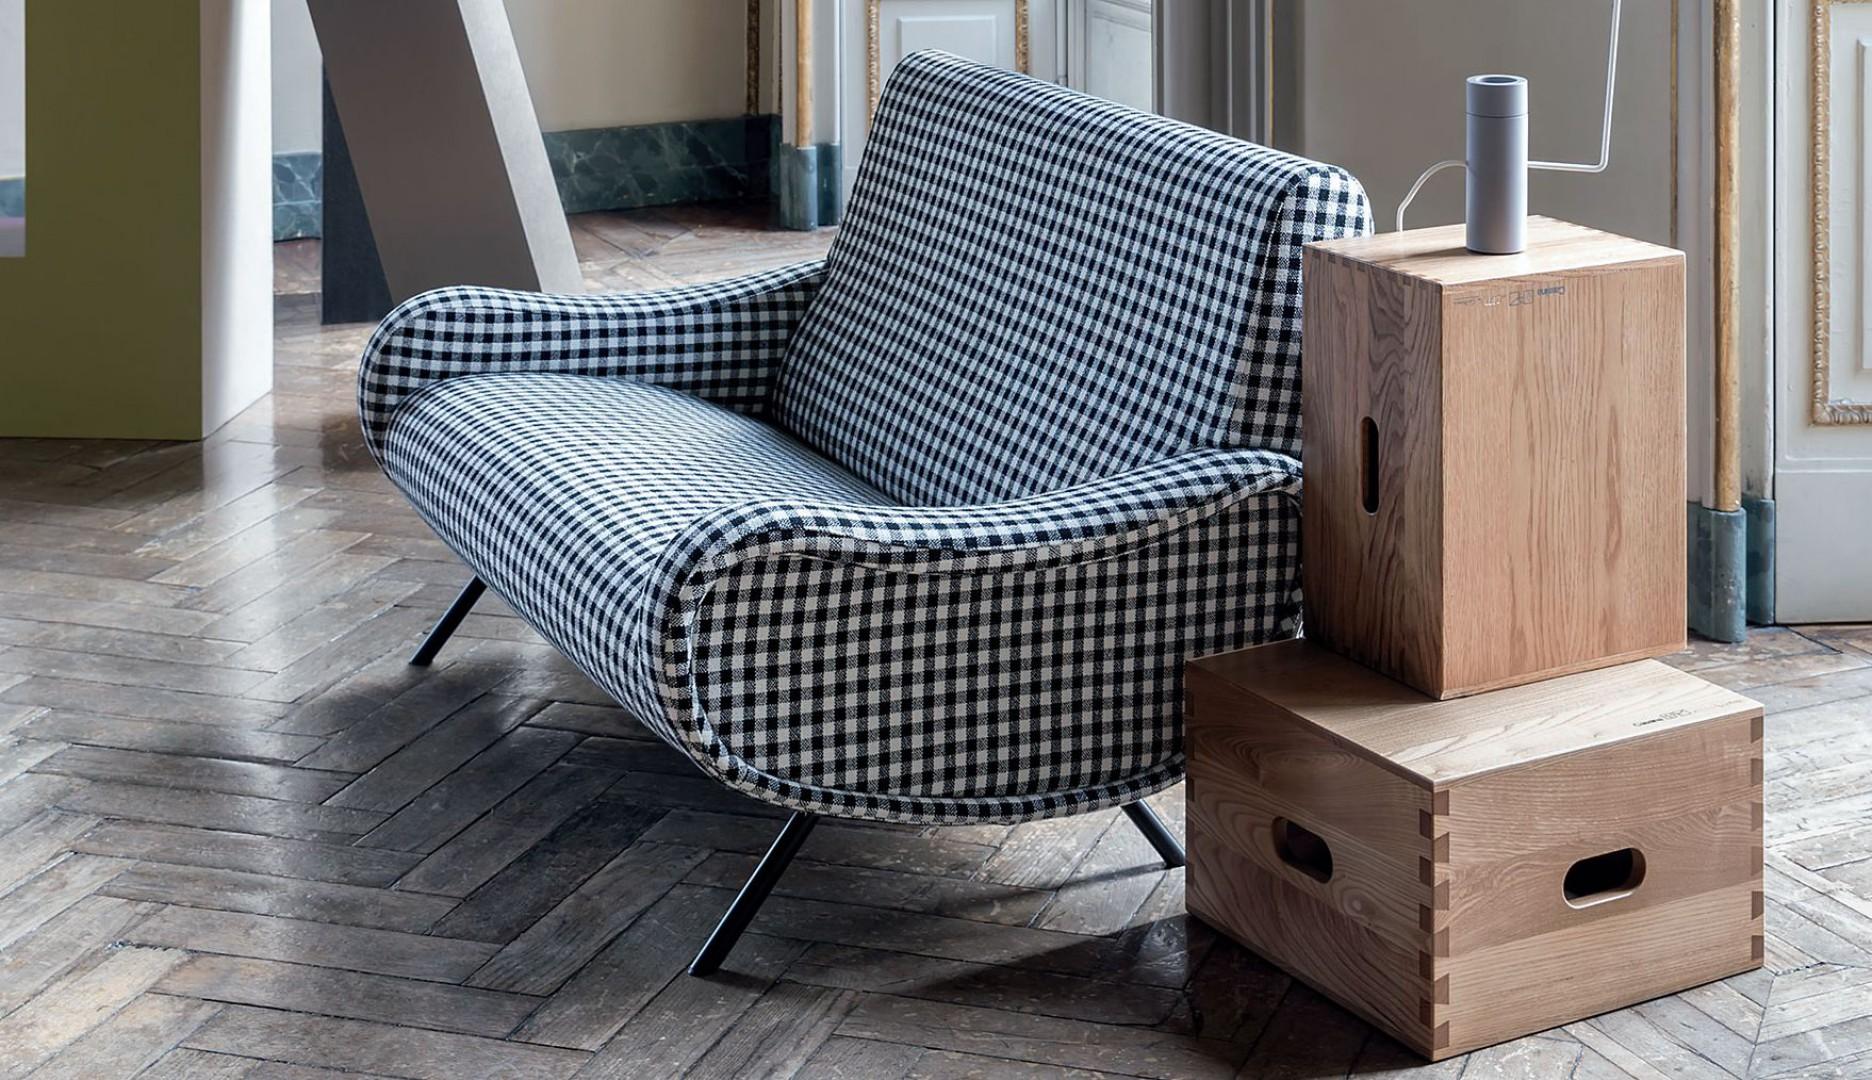 Sofa 720 Lady Divano firmy Cassina. Projekt: Marco Zanuso. Fot. Cassina